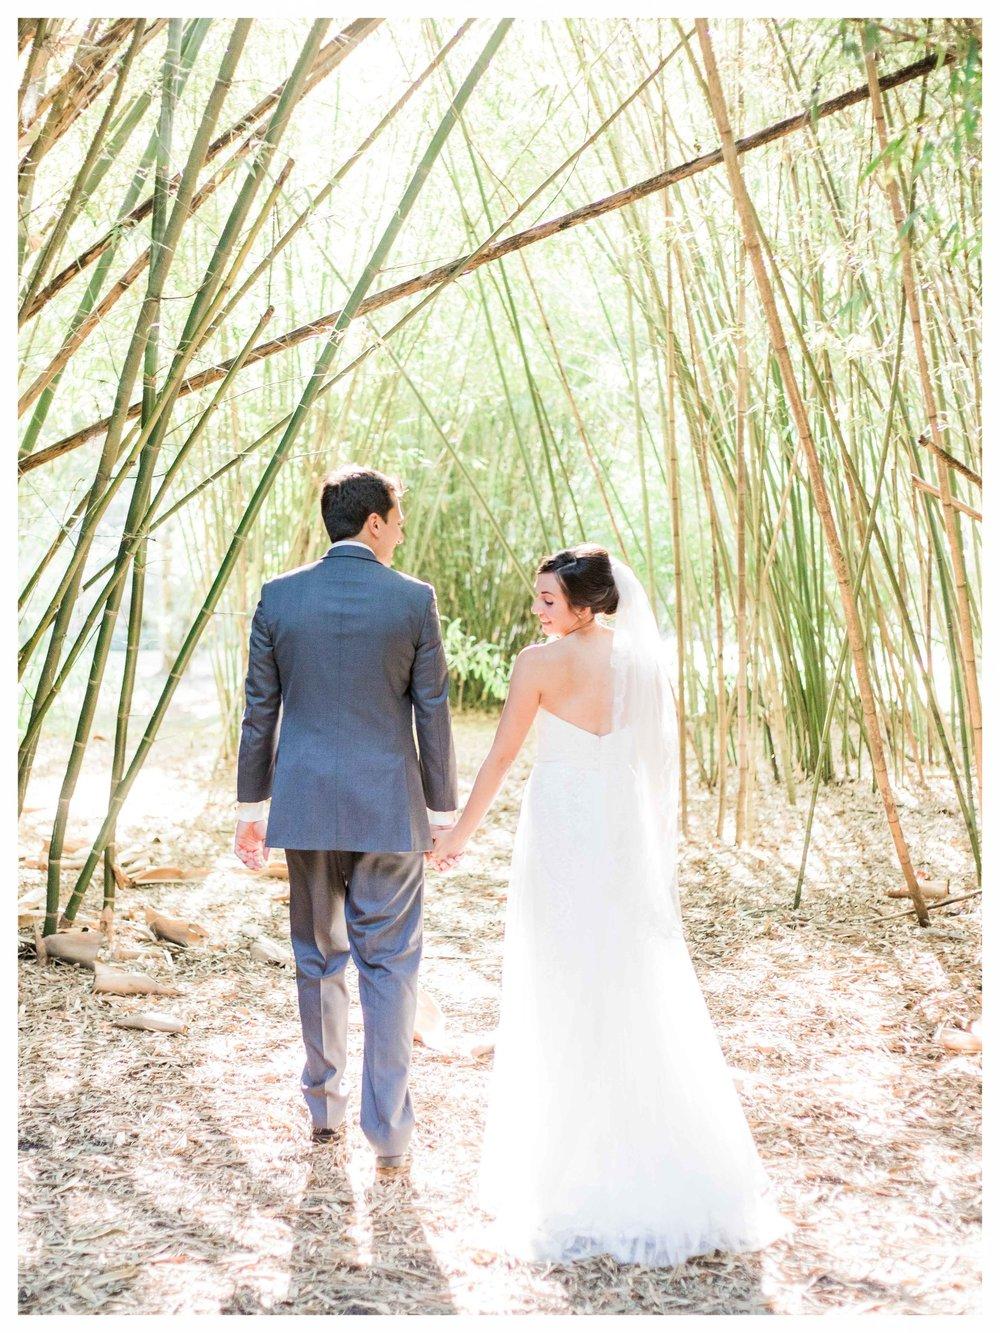 gunn_pre_wedding_first_look(184of231).jpg